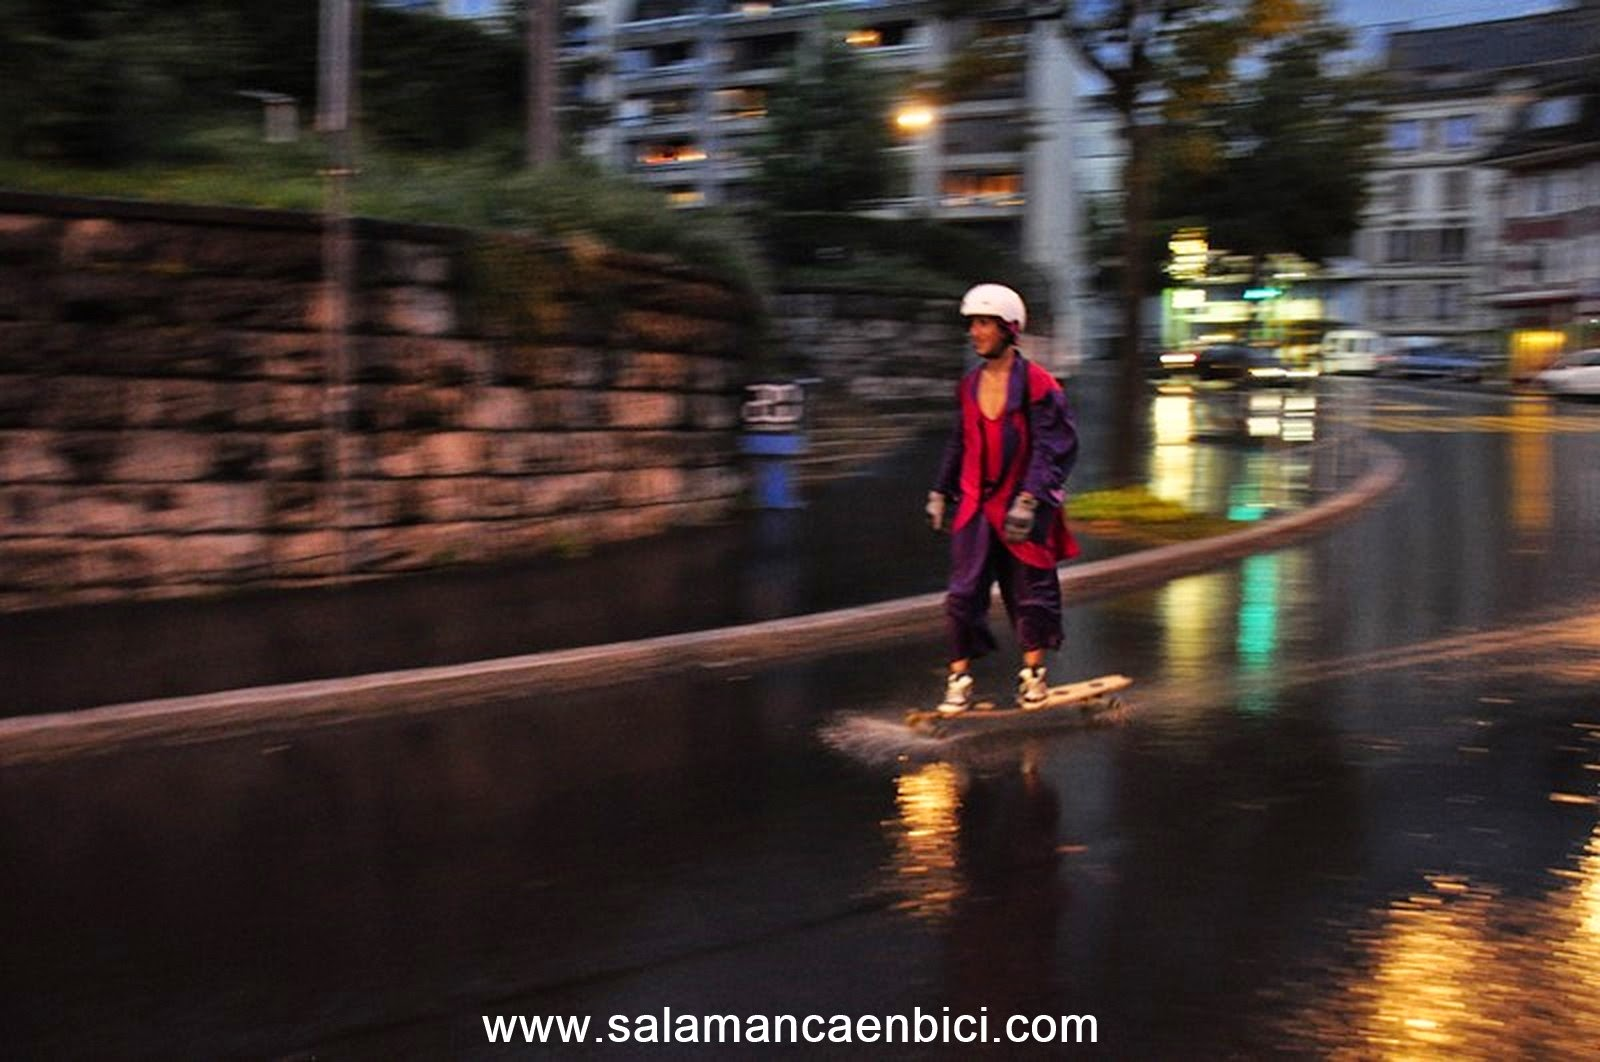 www.salamancaenbici.com